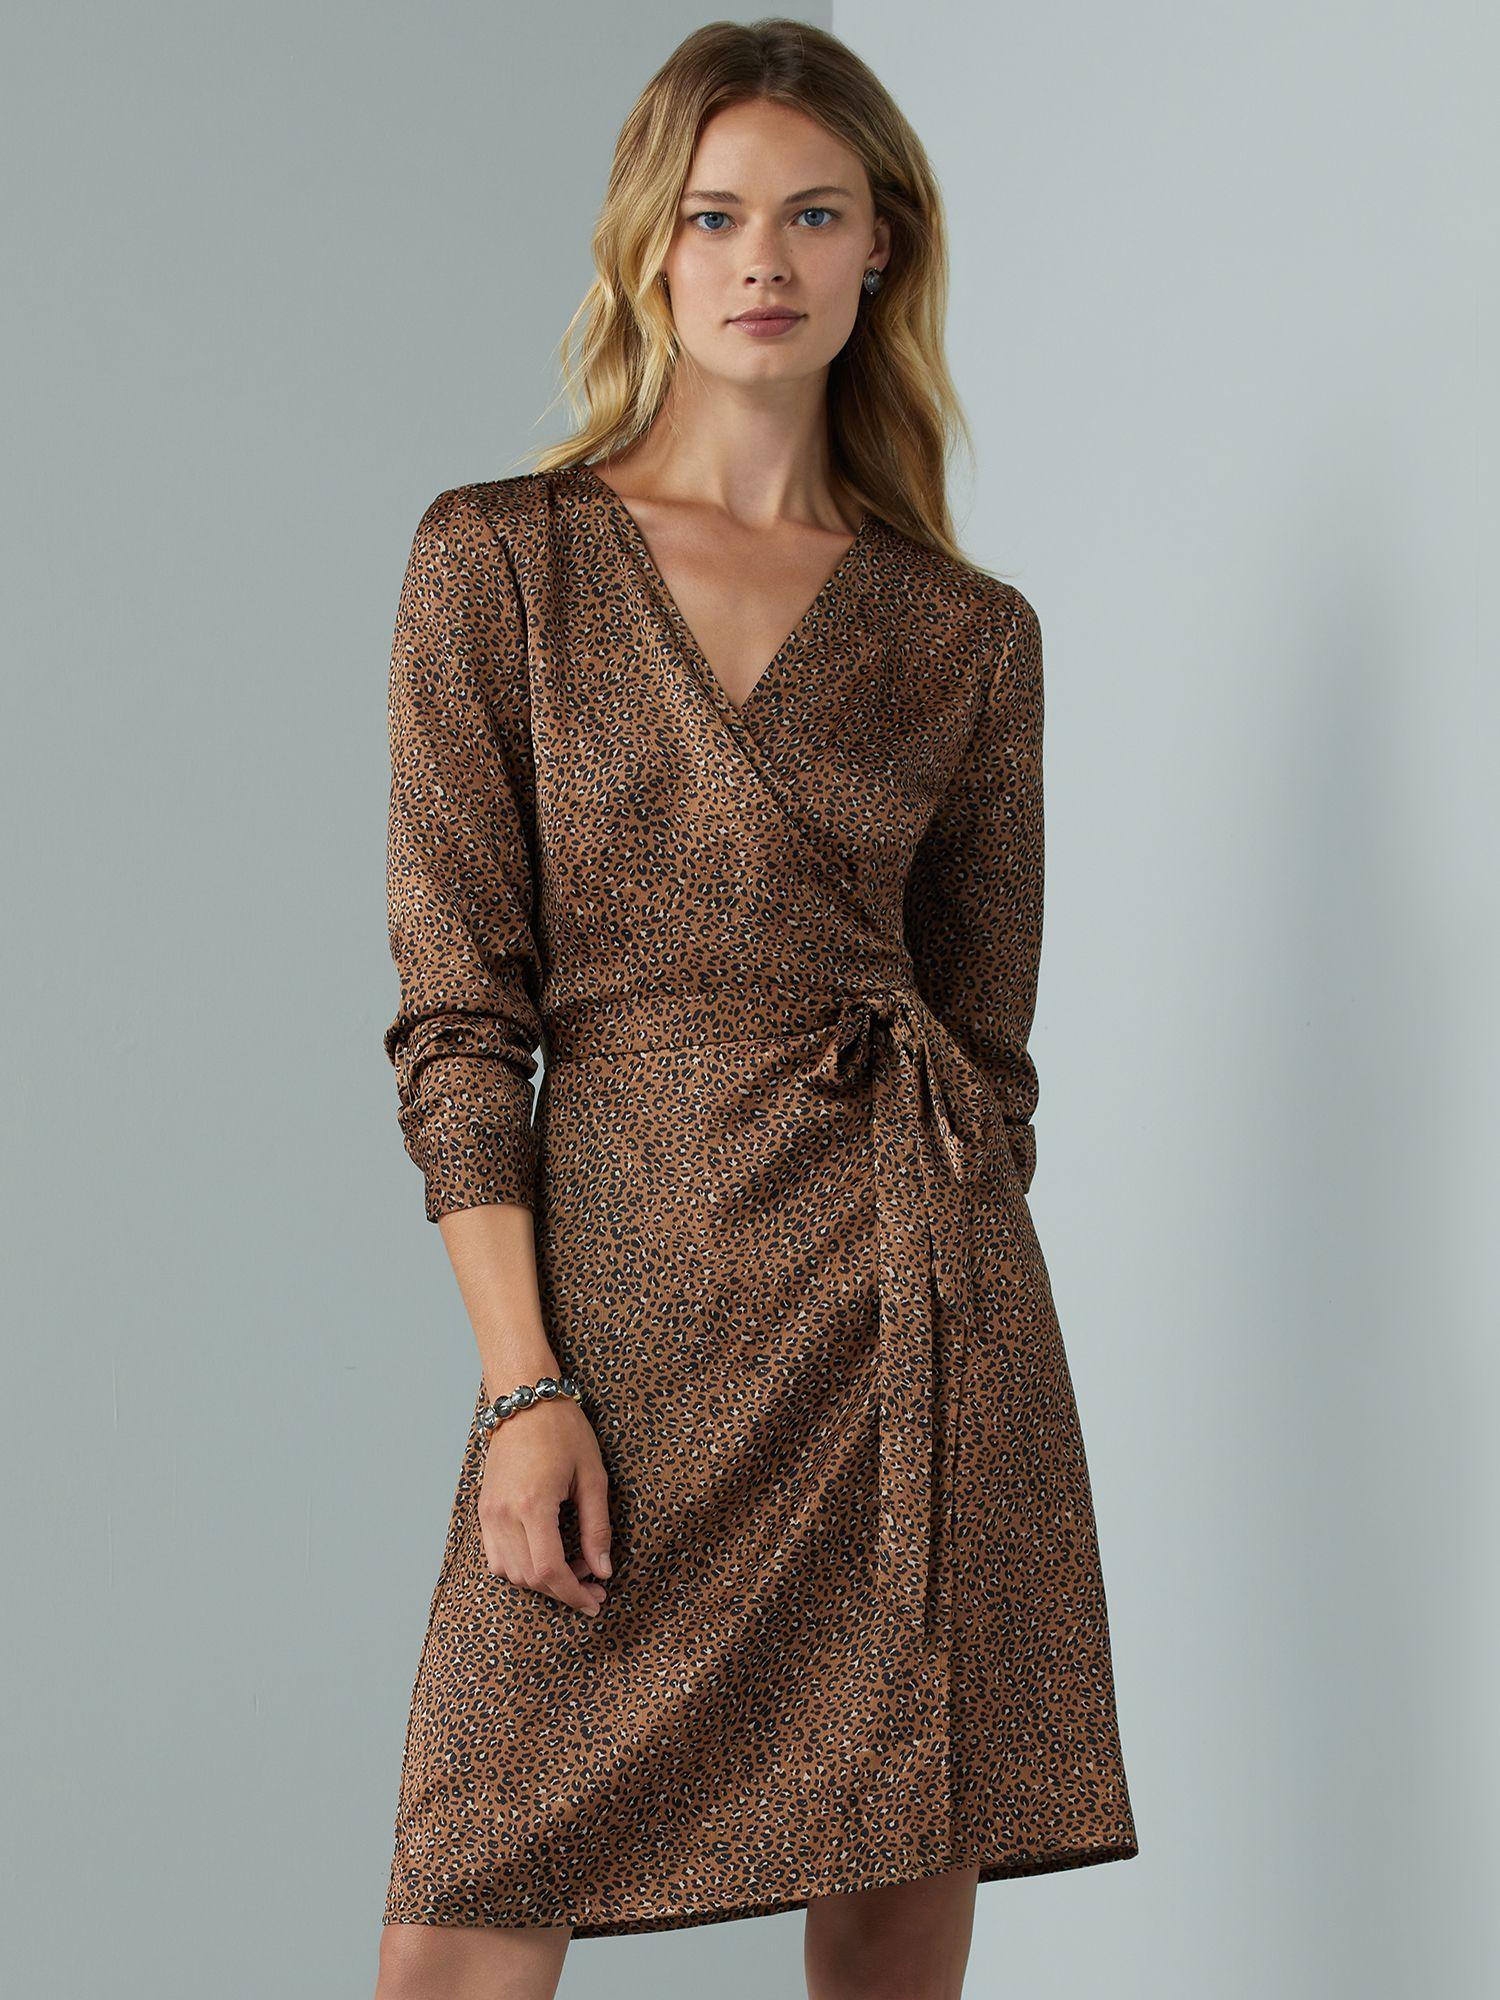 C Wonder C Wonder Women S Cheetah Print Wrap Dress With Side Tie Walmart Com In 2020 Printed Wrap Dresses Wrap Dress Wonder Womens [ 2000 x 1500 Pixel ]